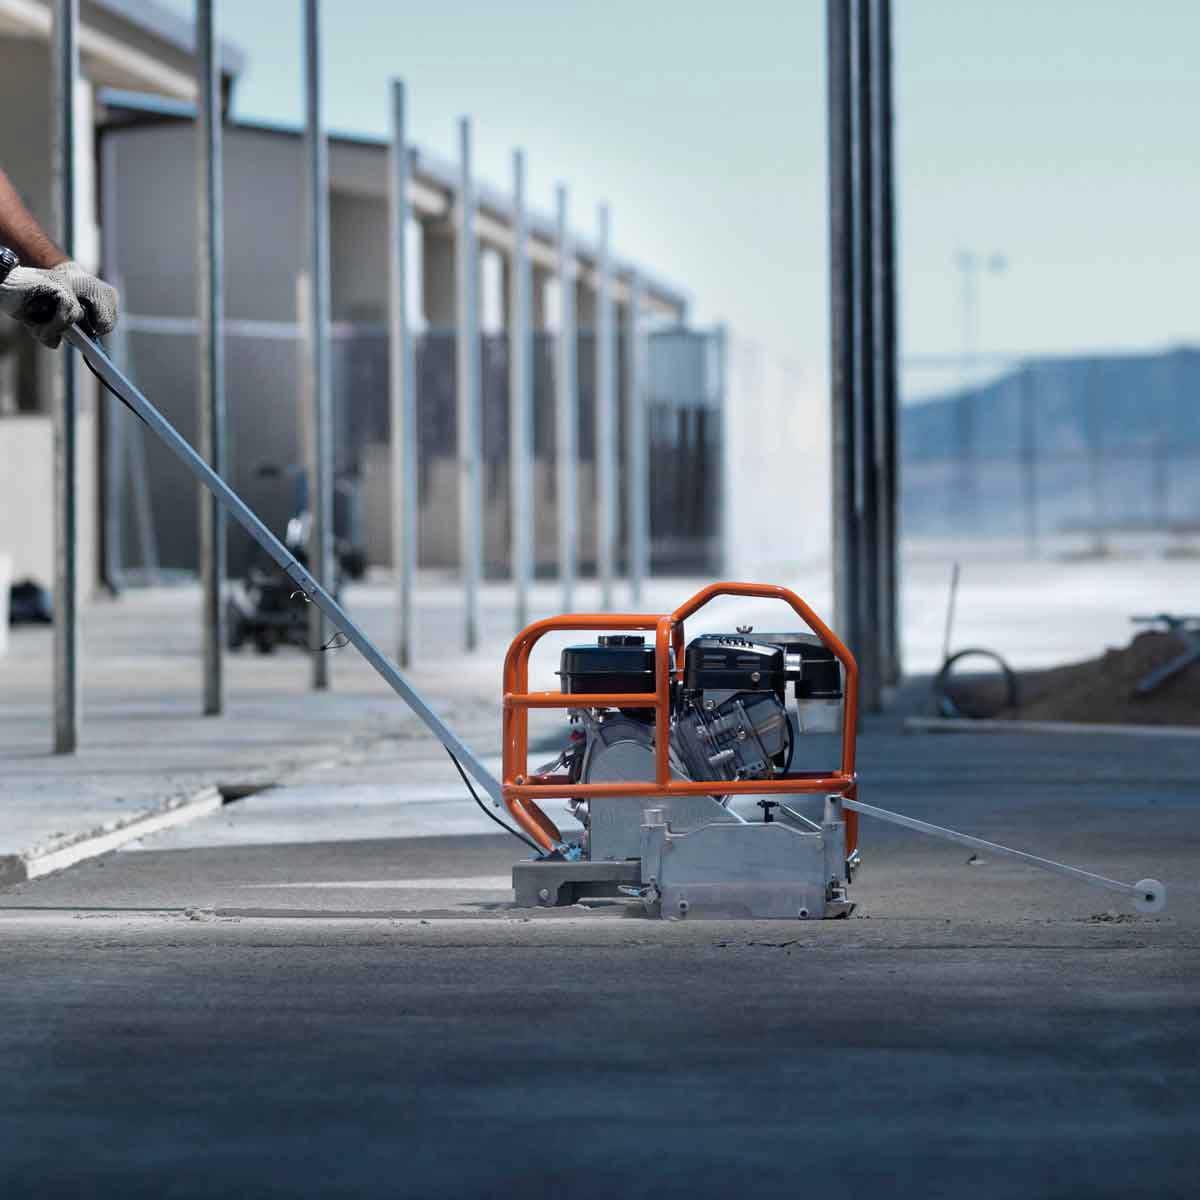 Husqvarna Soff Cut 150 Ultra Early Entry Green Concrete Saw